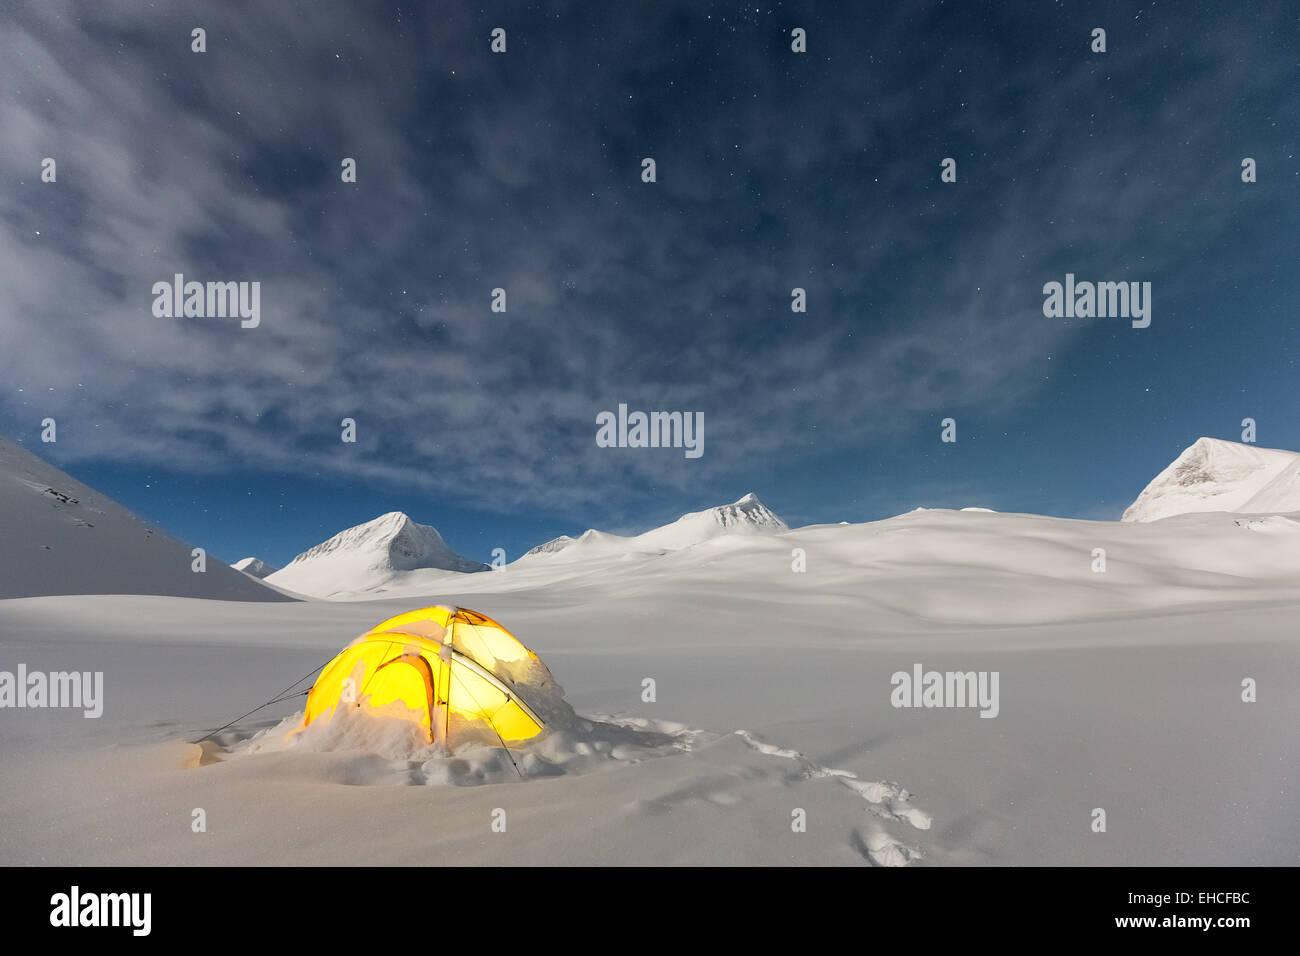 Camping à côté d'Nallostugan refuge, zone de montagne Kebnekaise, Kiruna, Suède, Europe, Photo Stock